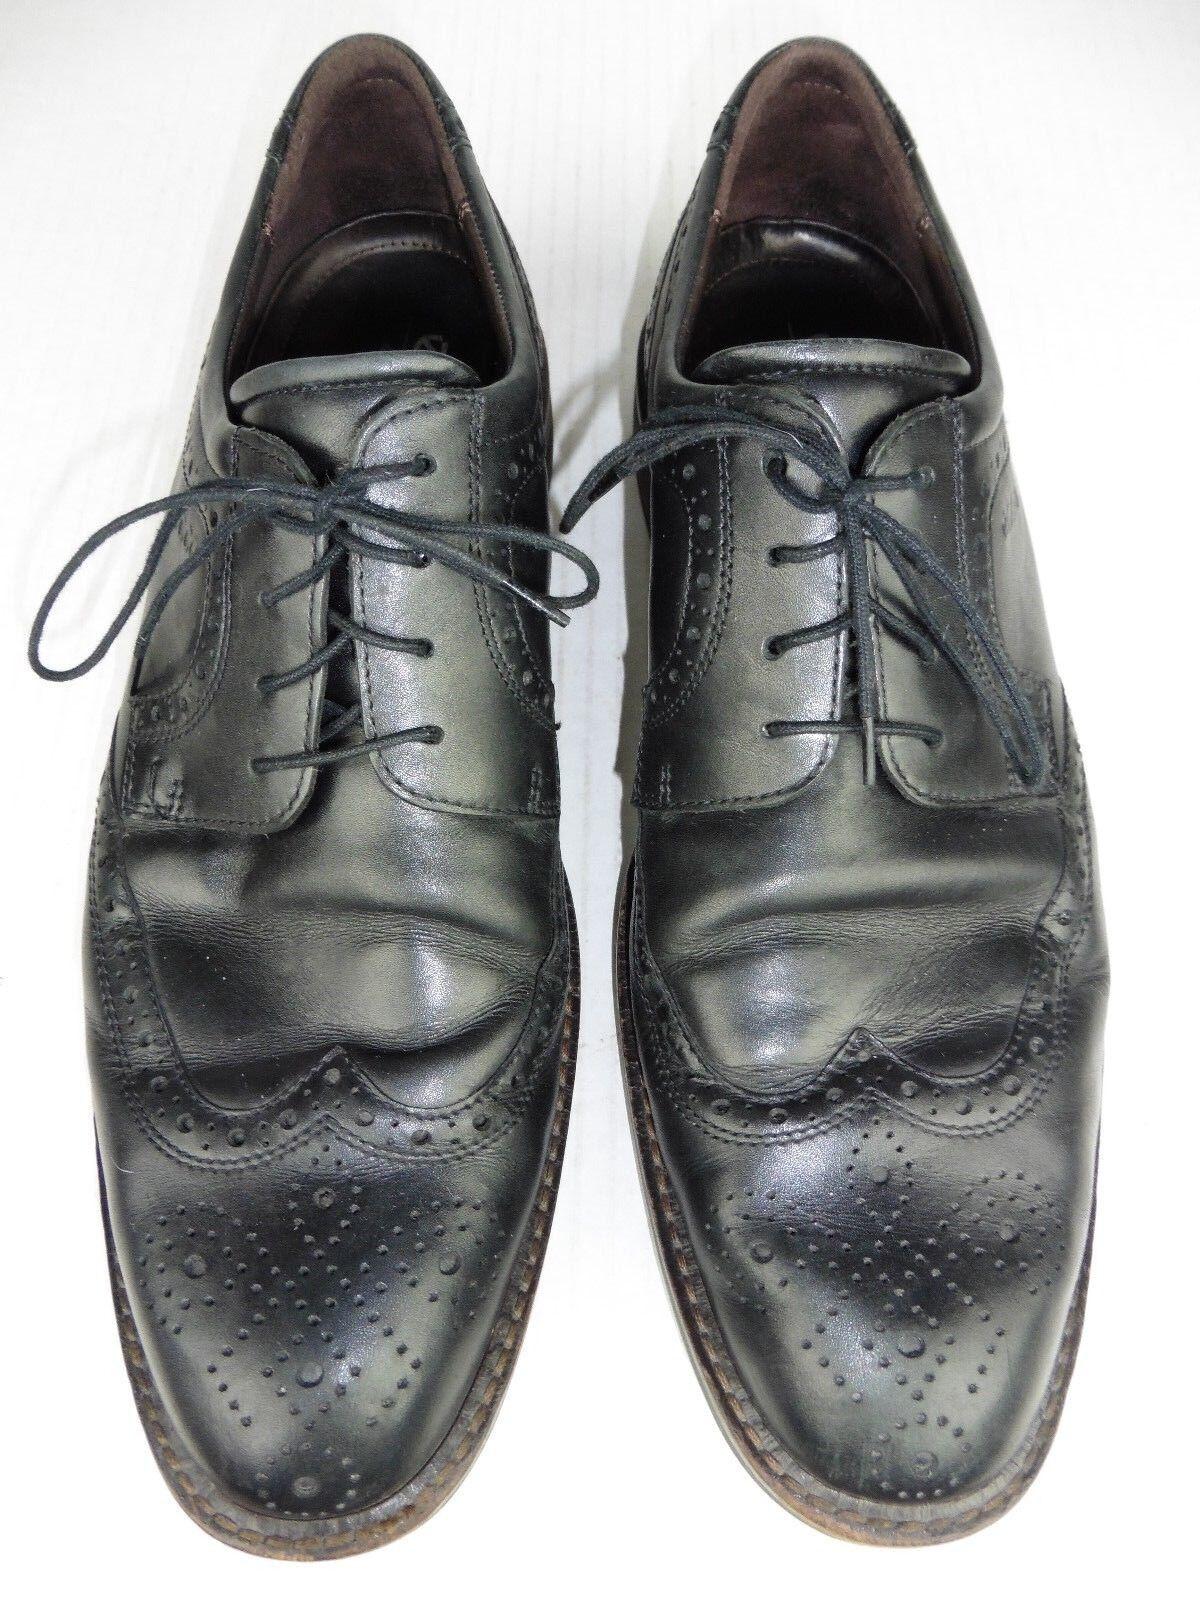 ECCO Mens 45 Size 11 Black Brogue Wingtip Leather Oxford Comfort Shoes Reg 170